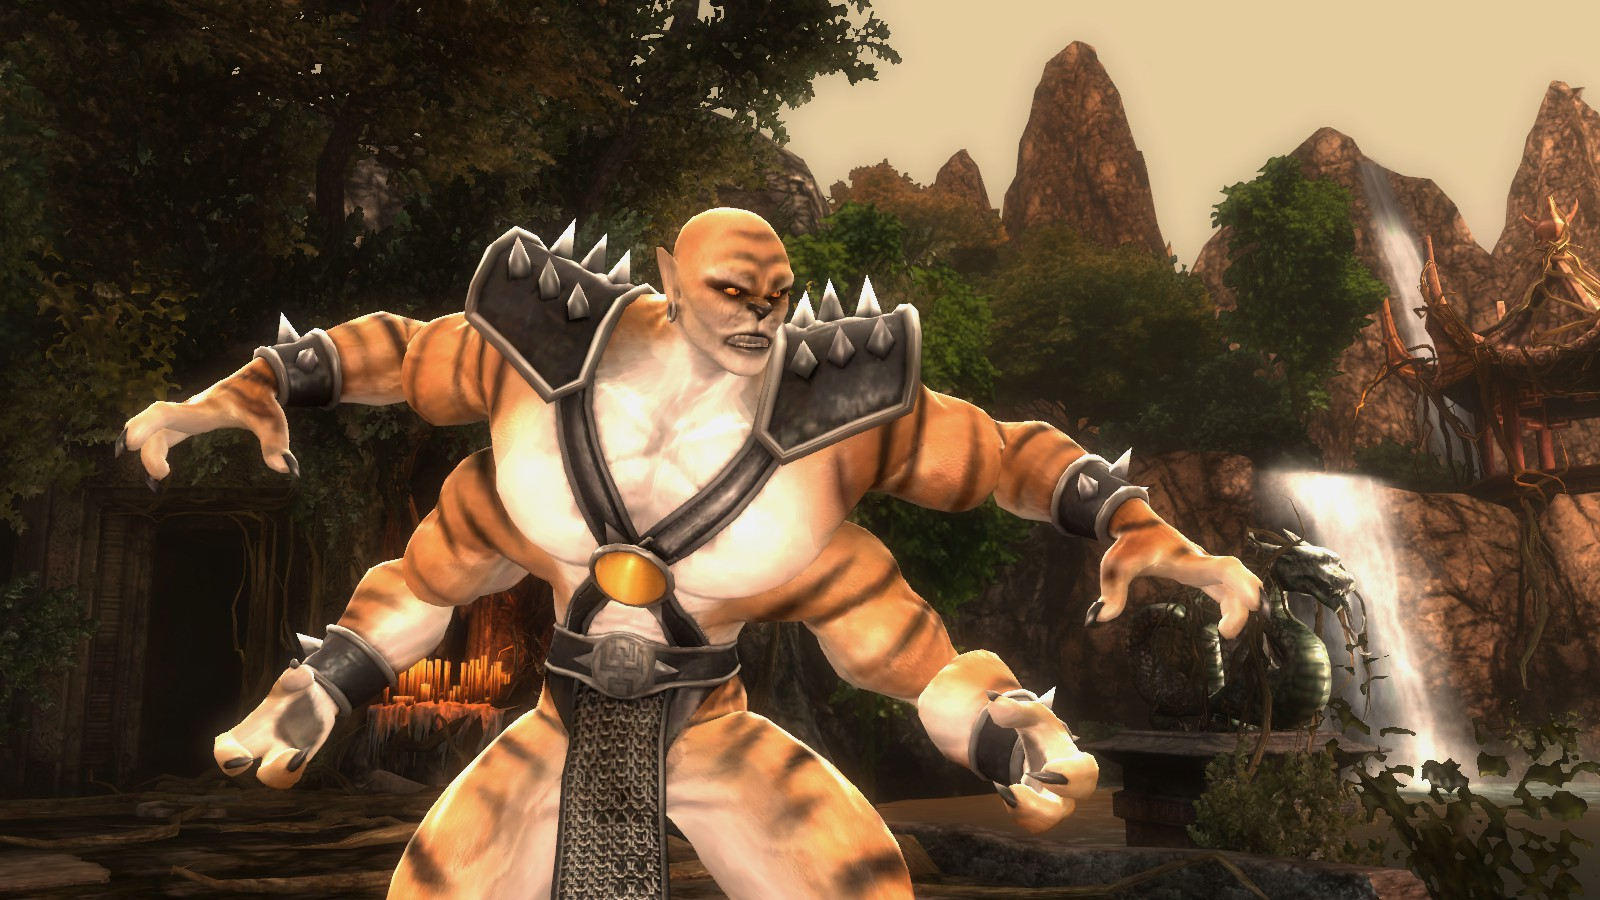 Mortal Kombat - Kintaro